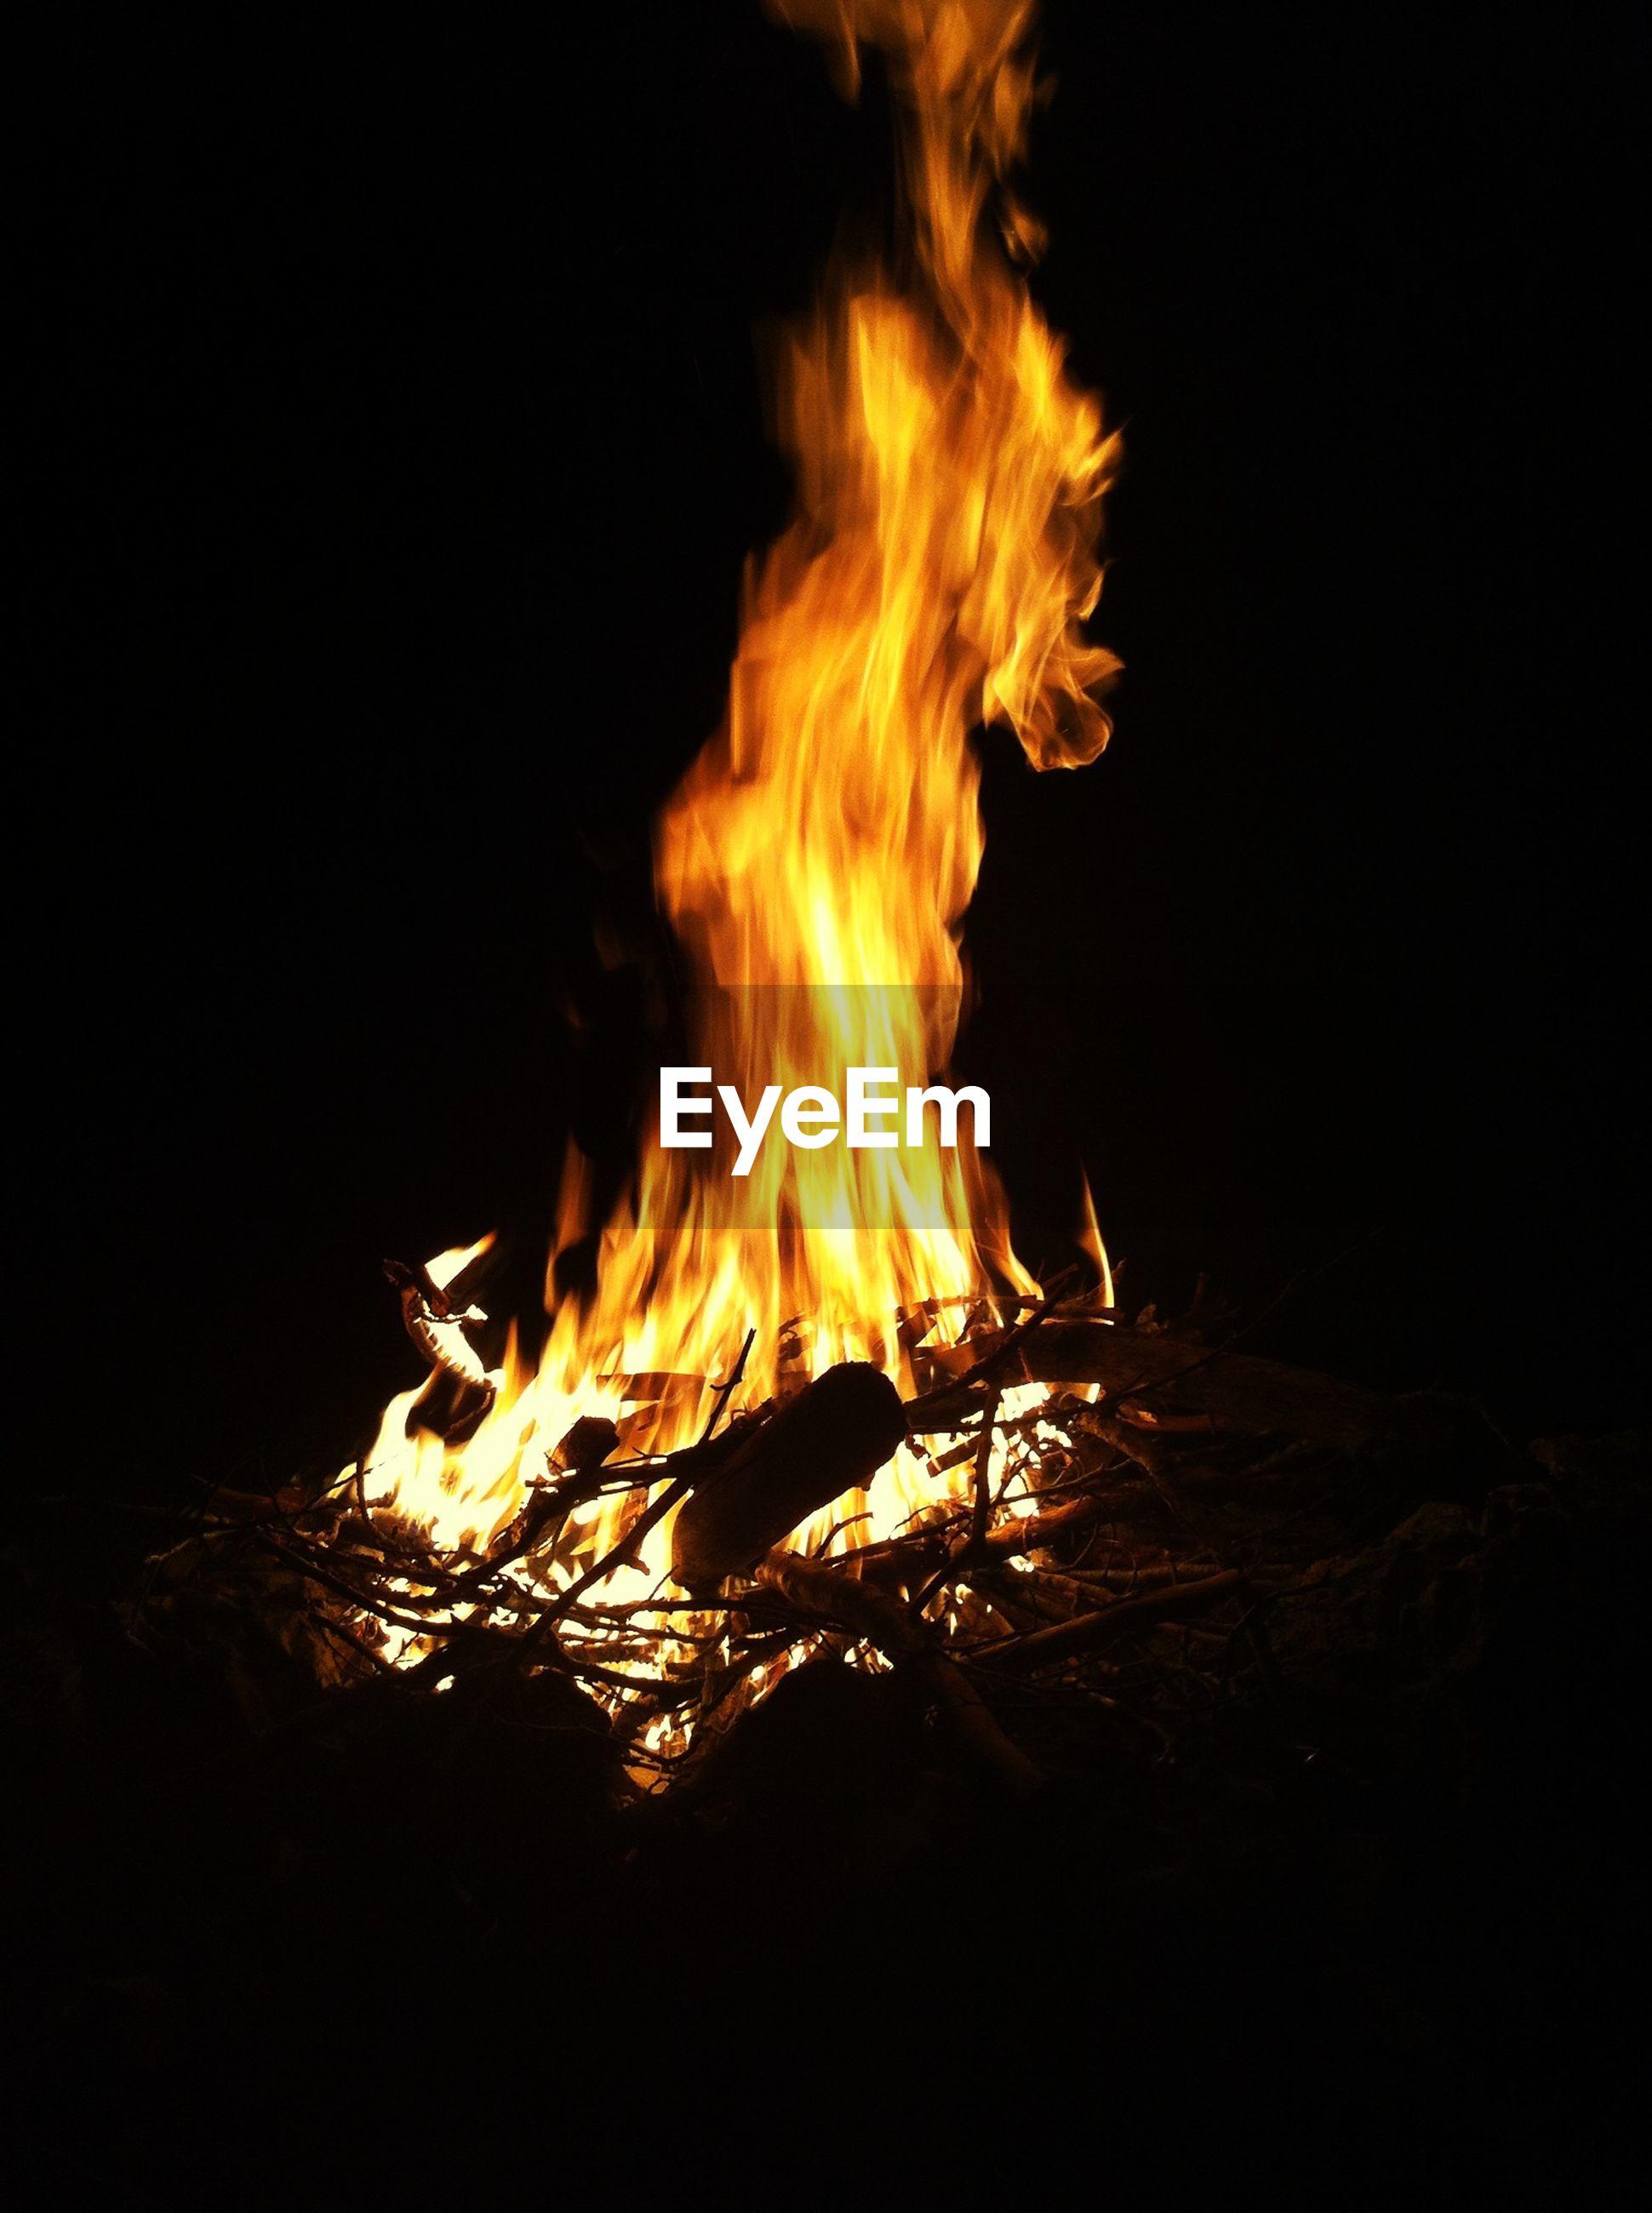 burning, flame, night, heat - temperature, fire - natural phenomenon, bonfire, glowing, motion, fire, copy space, firewood, dark, campfire, long exposure, close-up, studio shot, black background, orange color, heat, no people